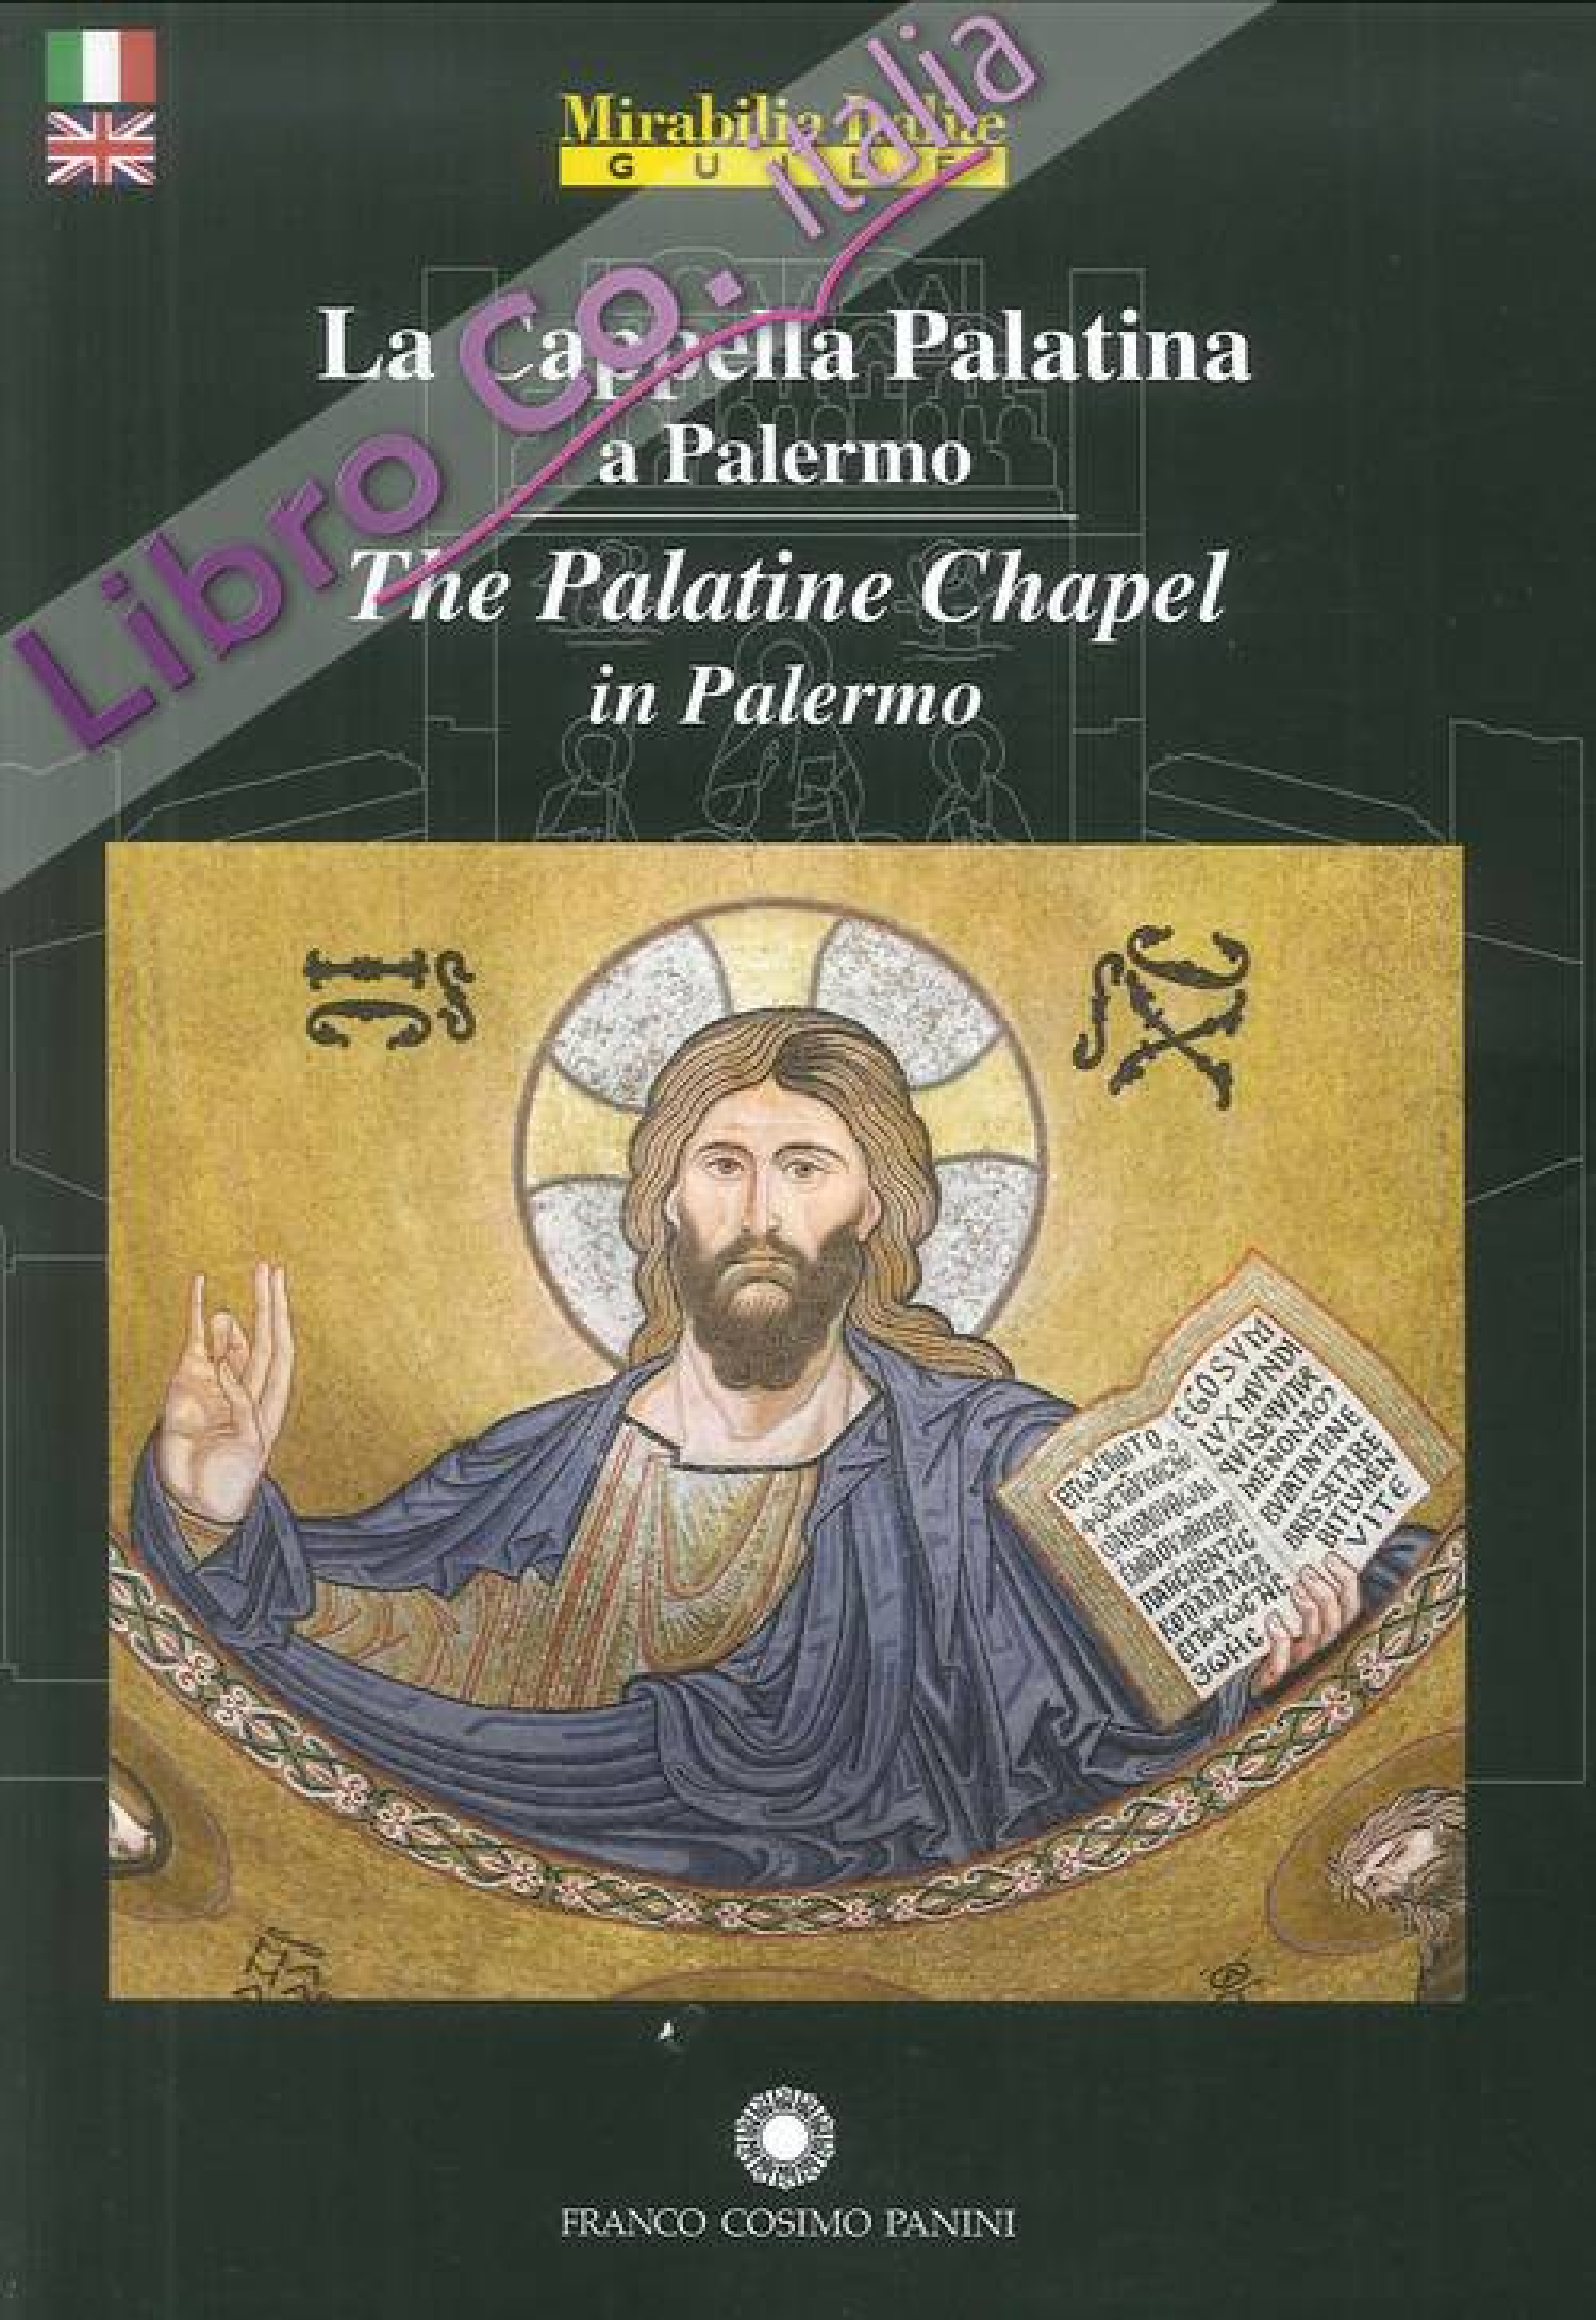 La Cappella Palatina a Palermo. The Palatine Chapel in Palermo.